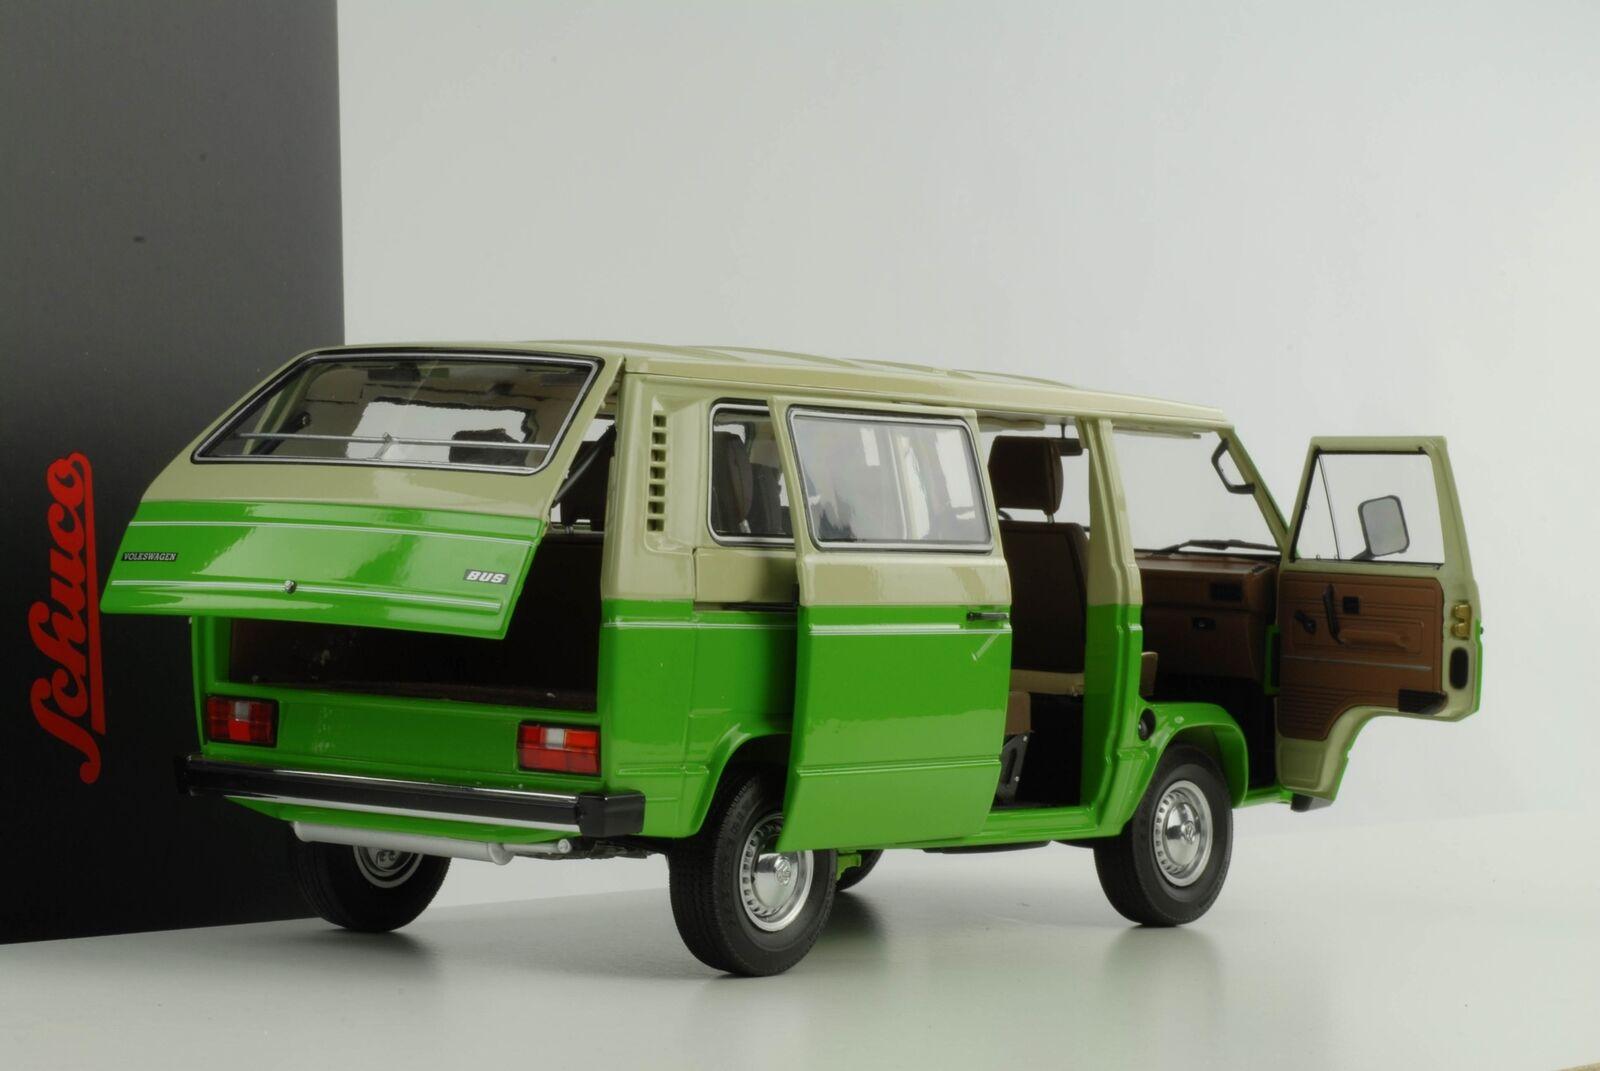 VW t3 BUS VOLKSWAGEN verde Crema 1 18 Schuco Diecast